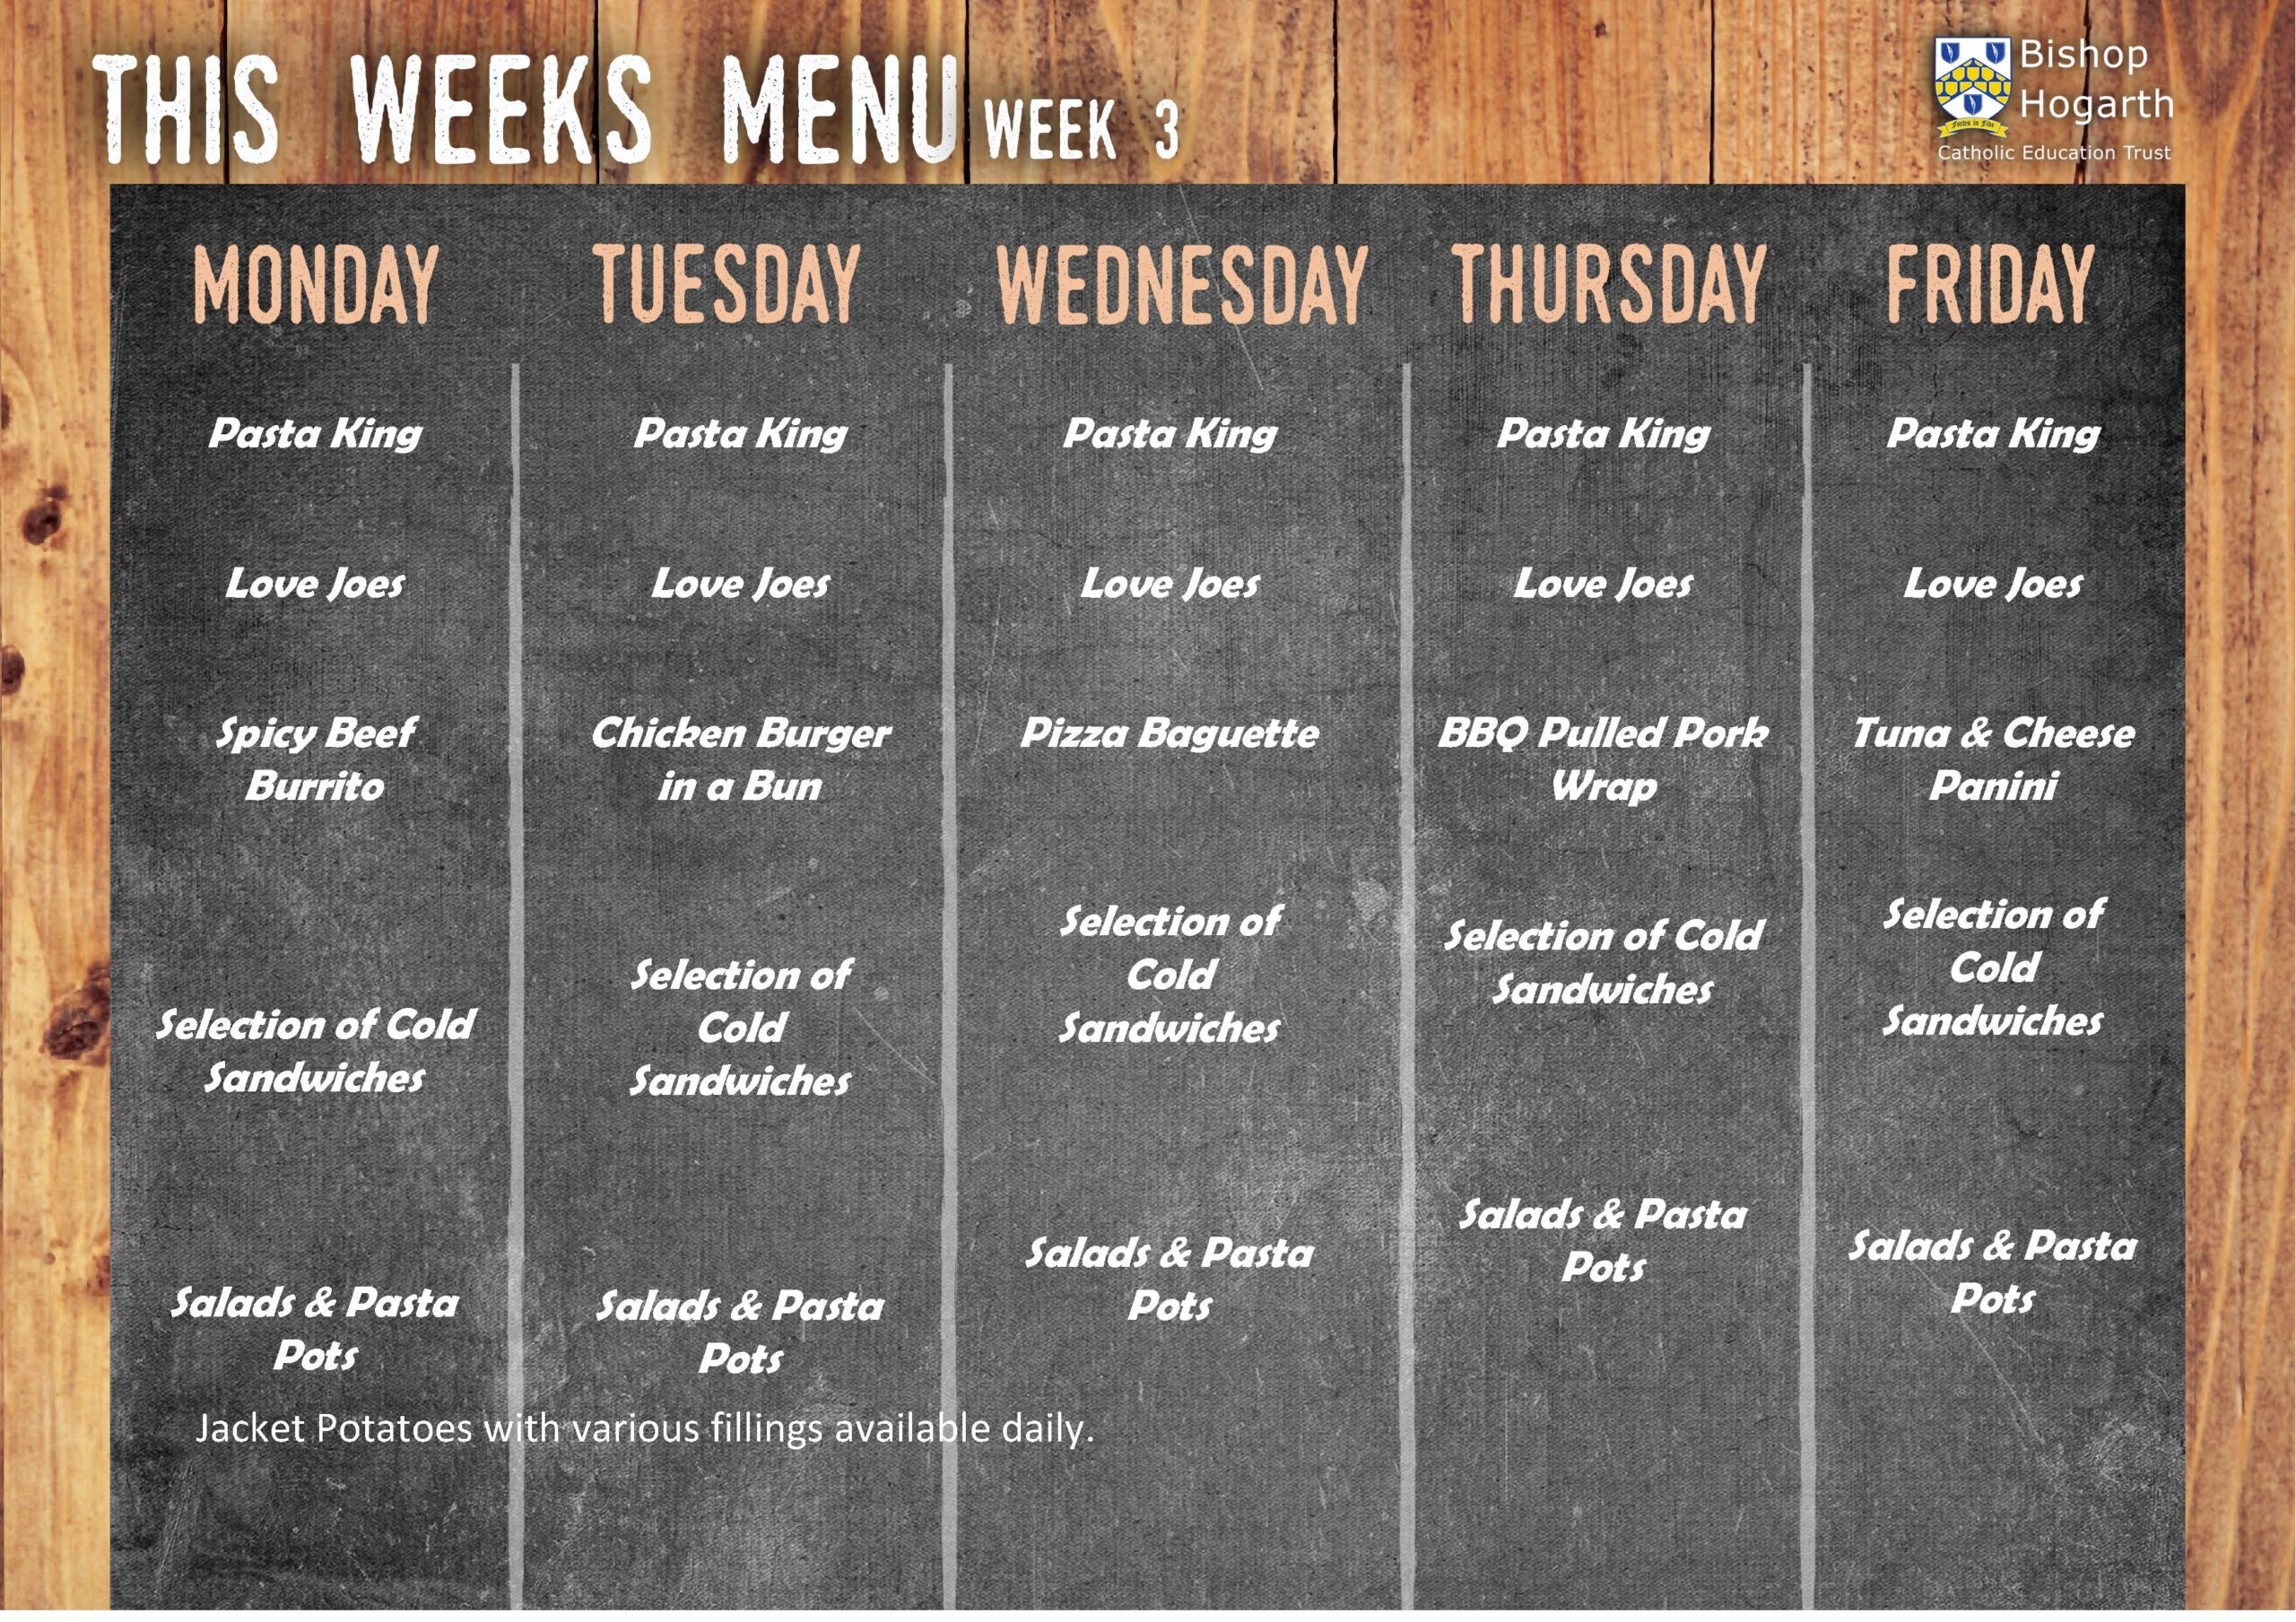 Additional Menu Week 3